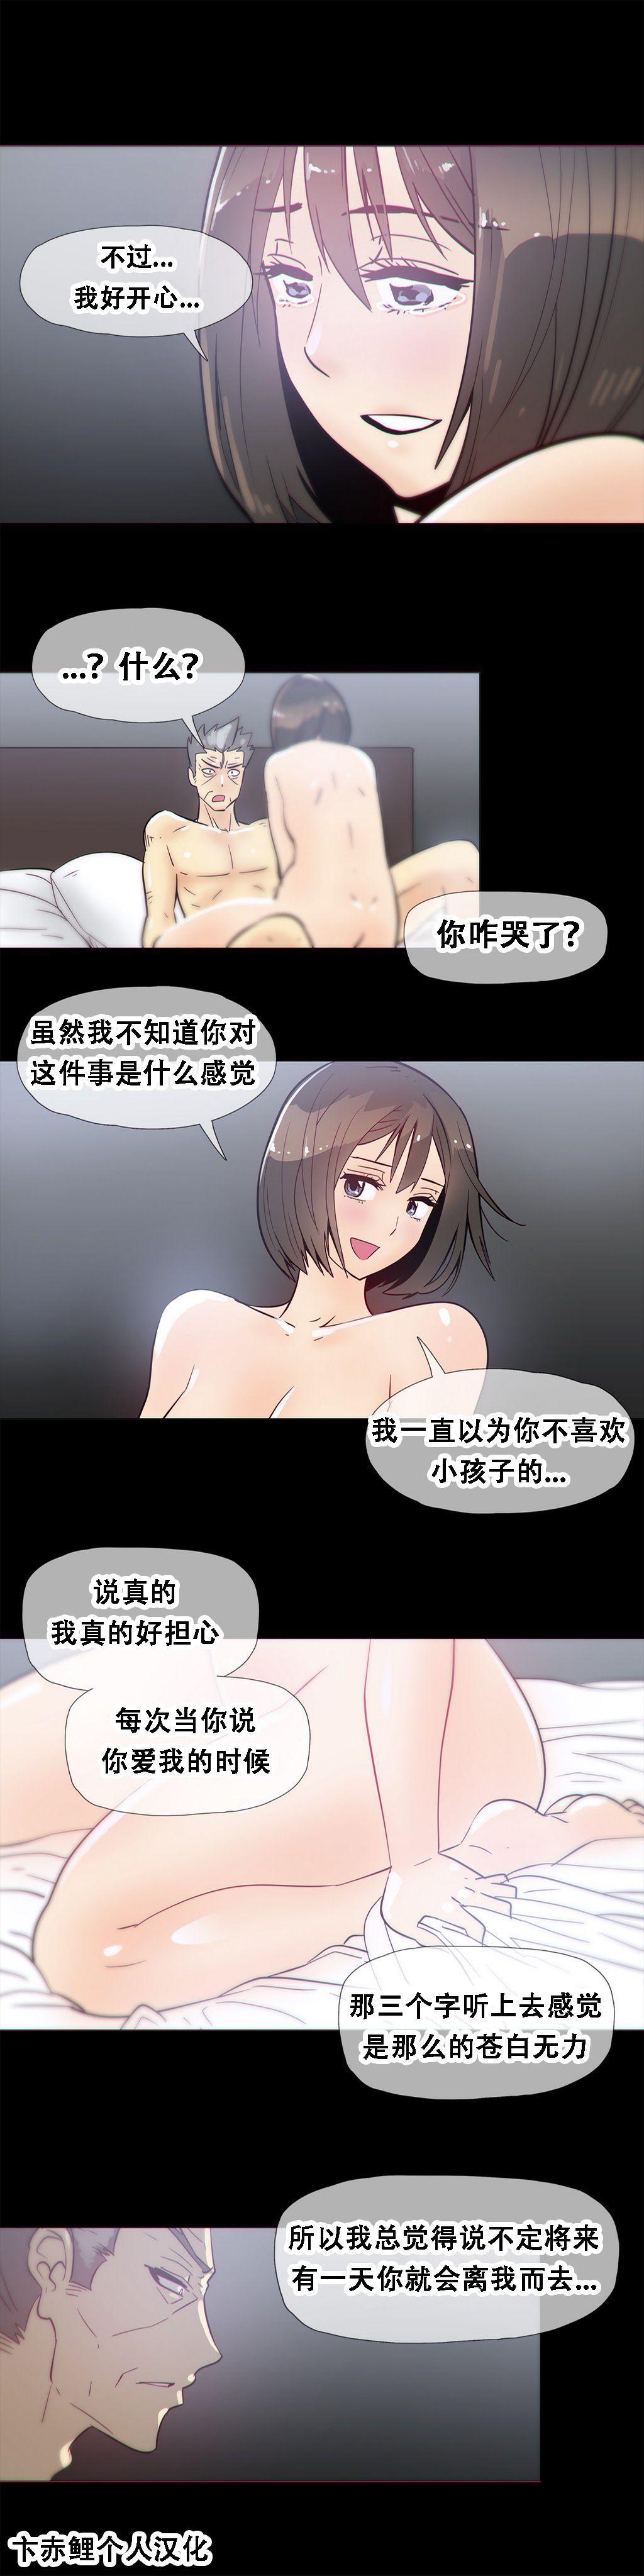 HouseHold Affairs 【卞赤鲤个人汉化】1~33话(持续更新中) 390